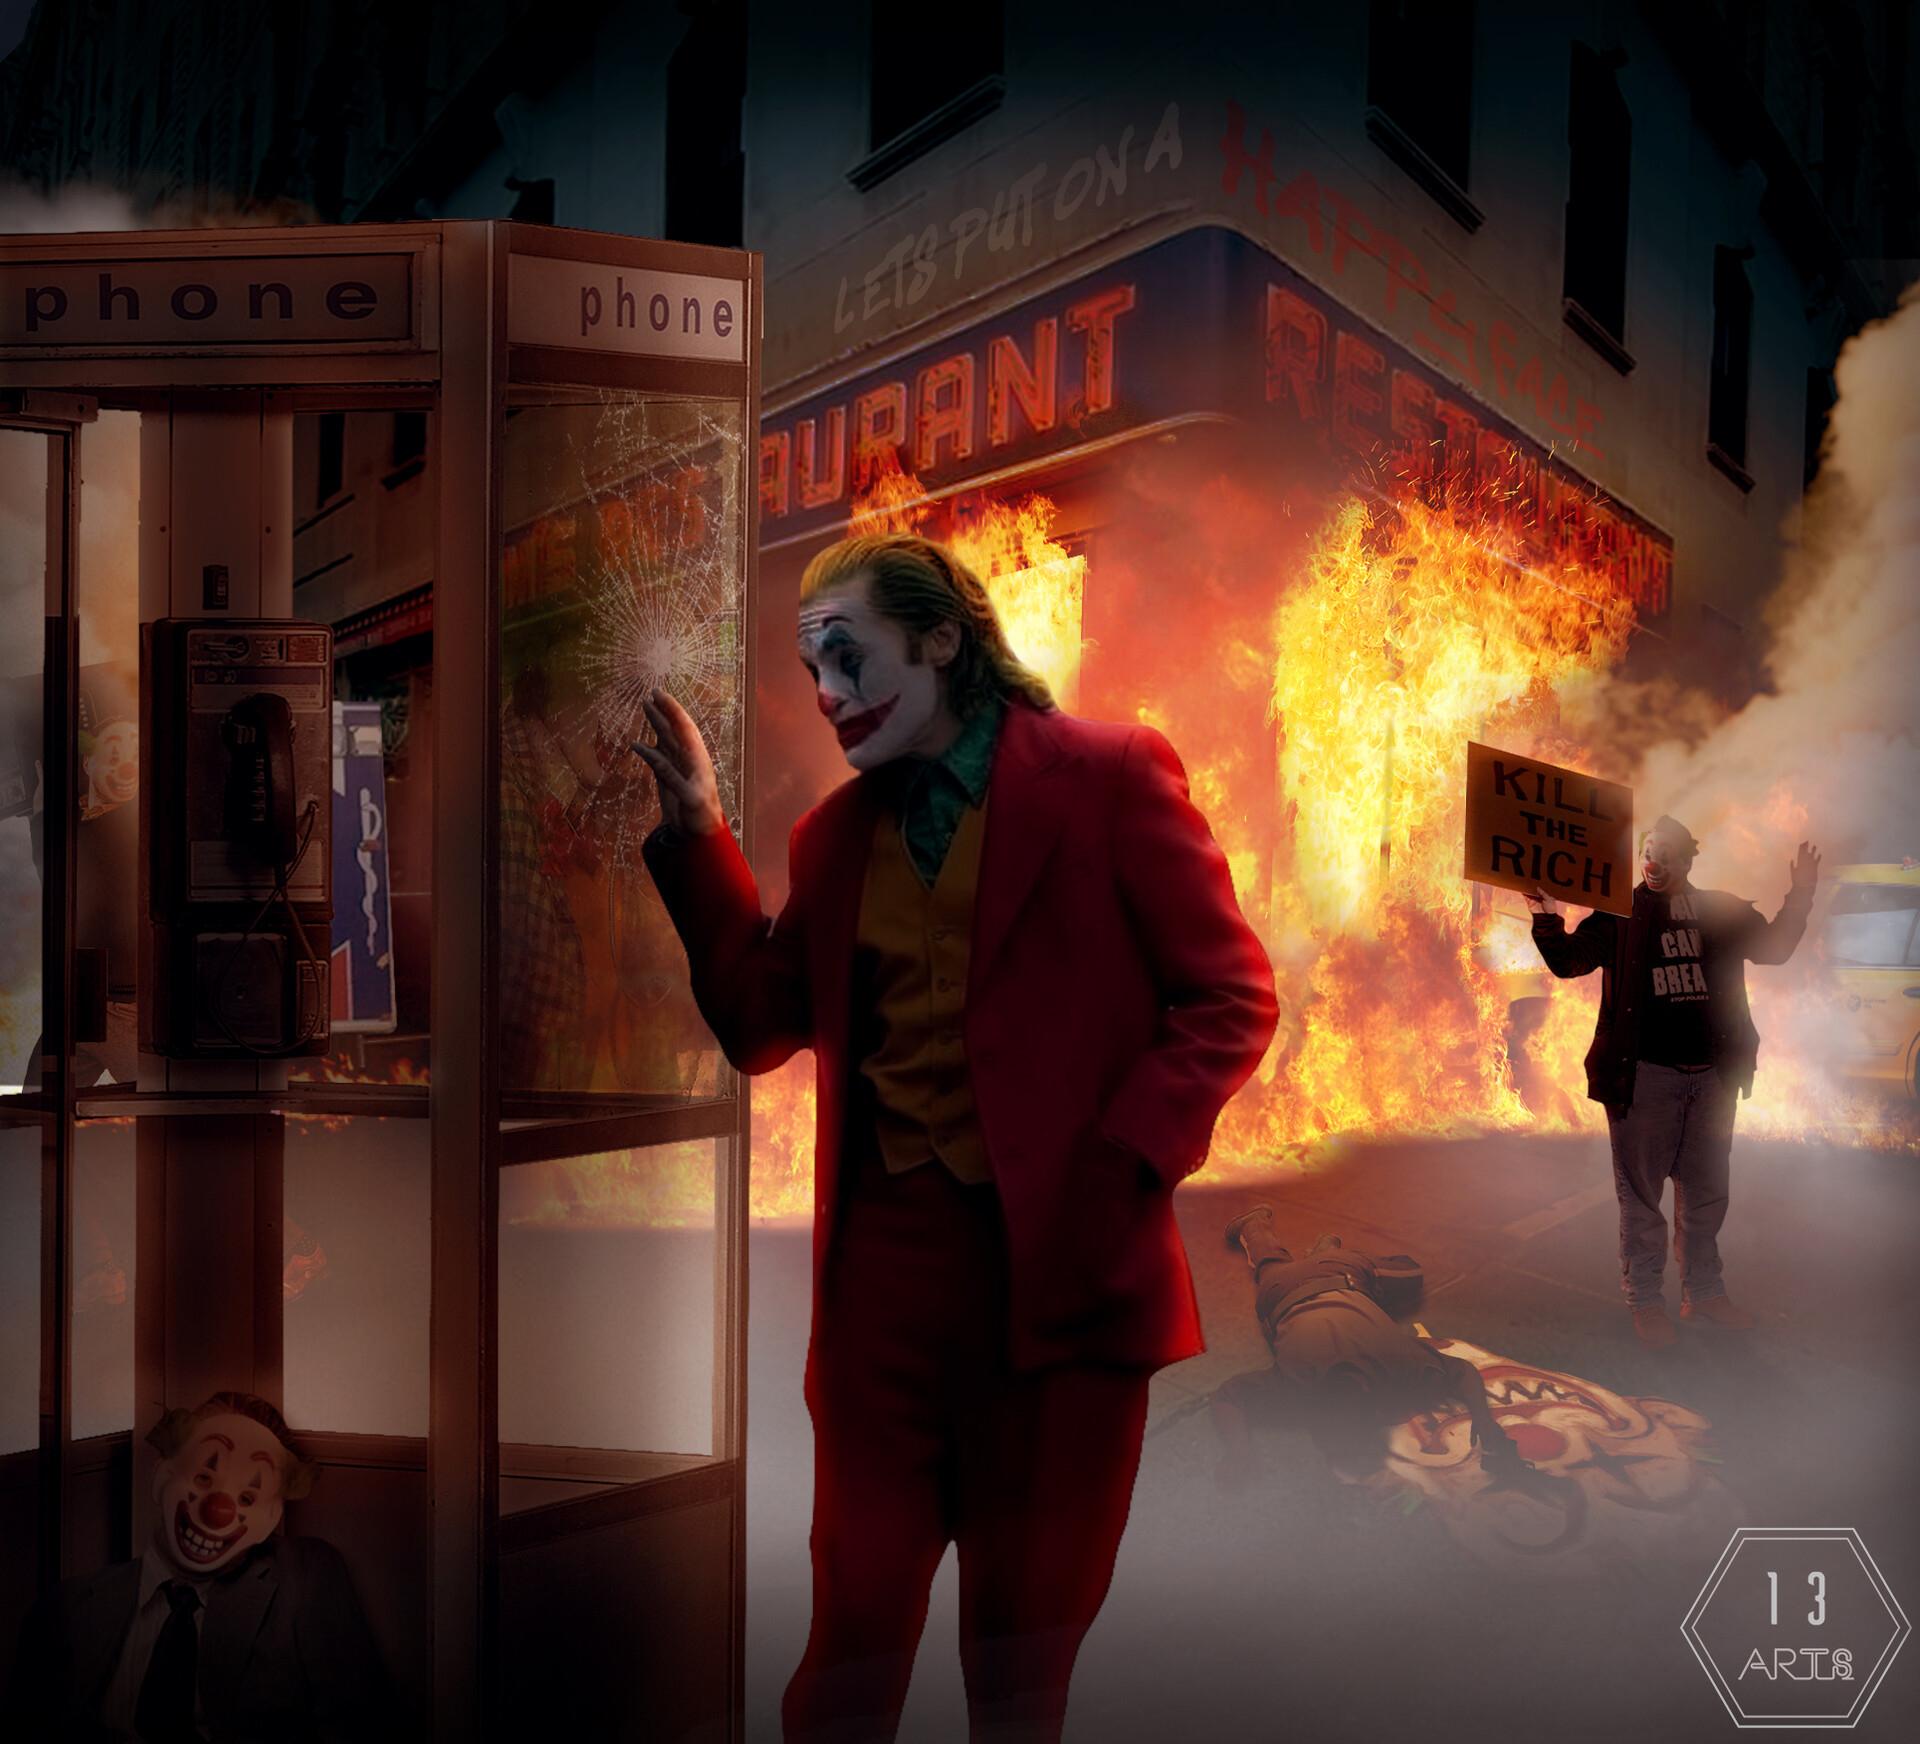 Sad Joker Wallpaper Hd Superheroes 4k Wallpapers Images